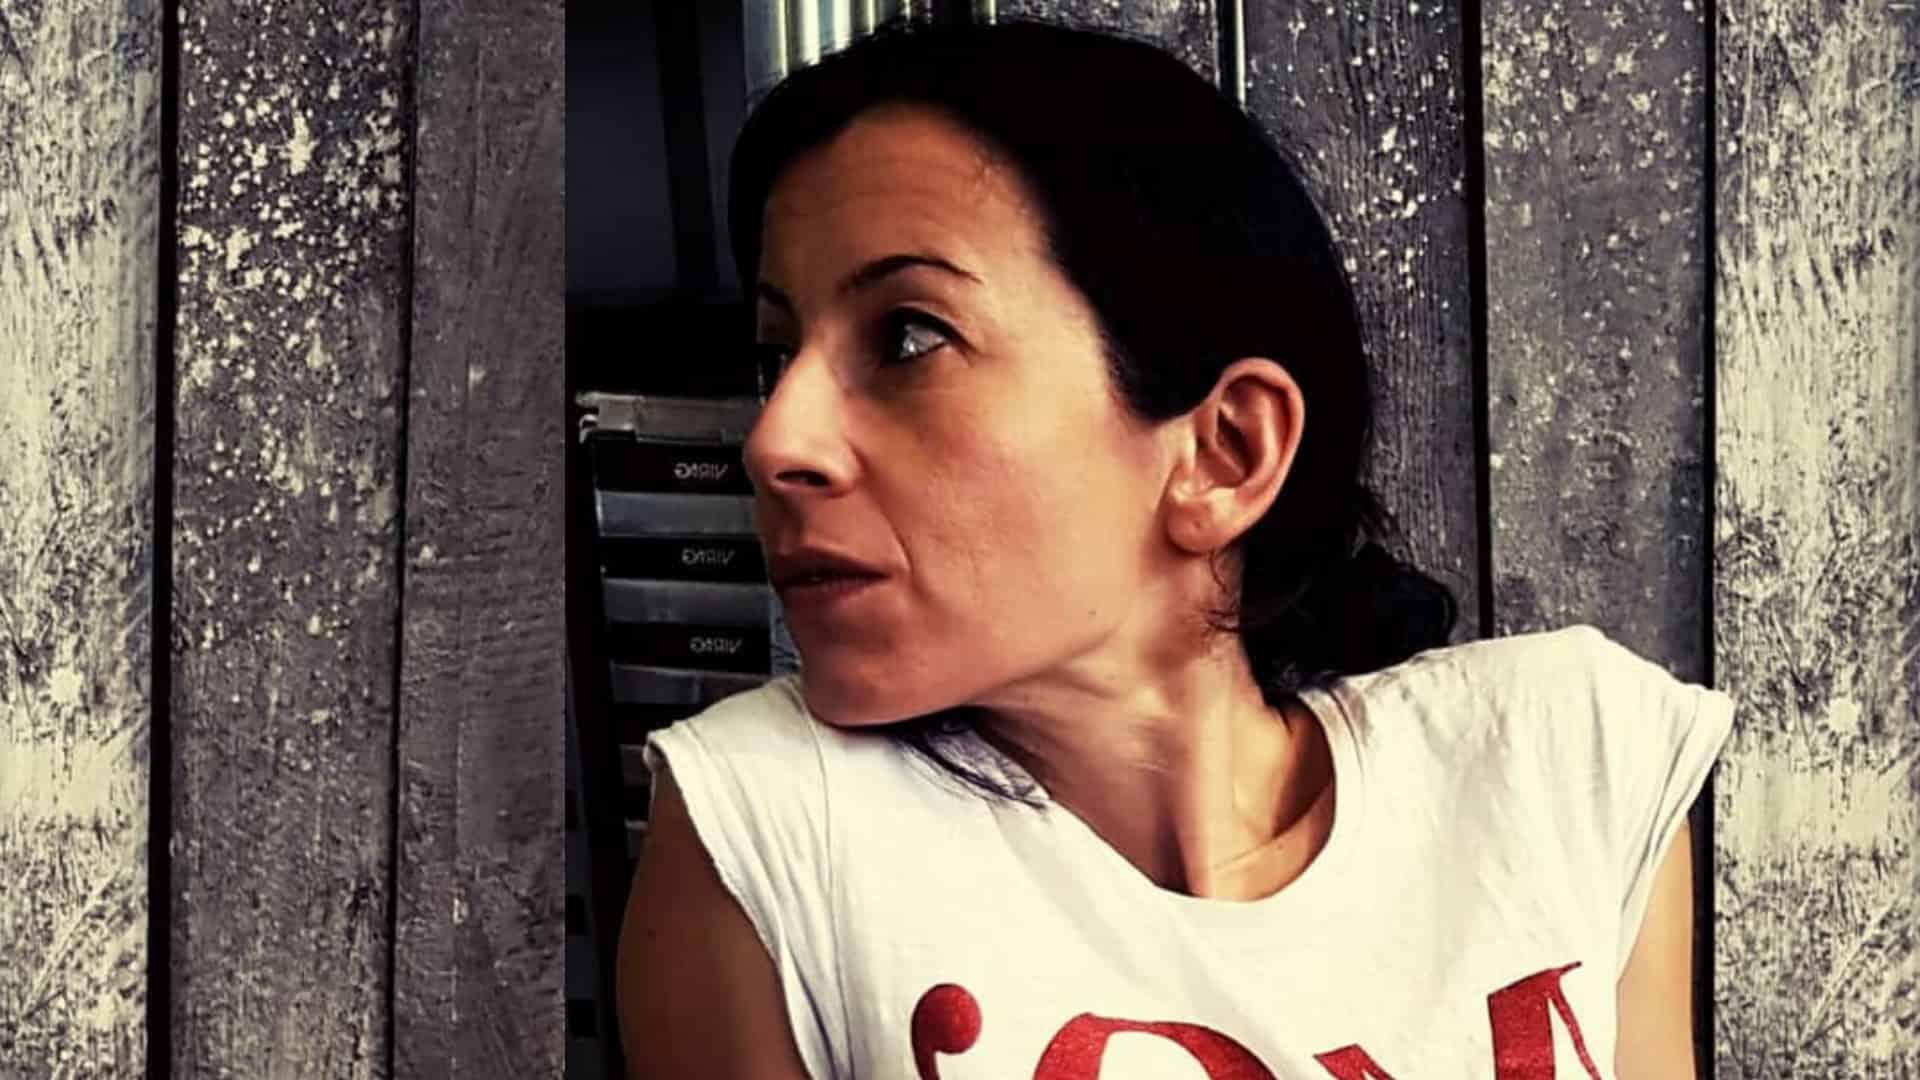 Paola Pisano home - sfumature digitali